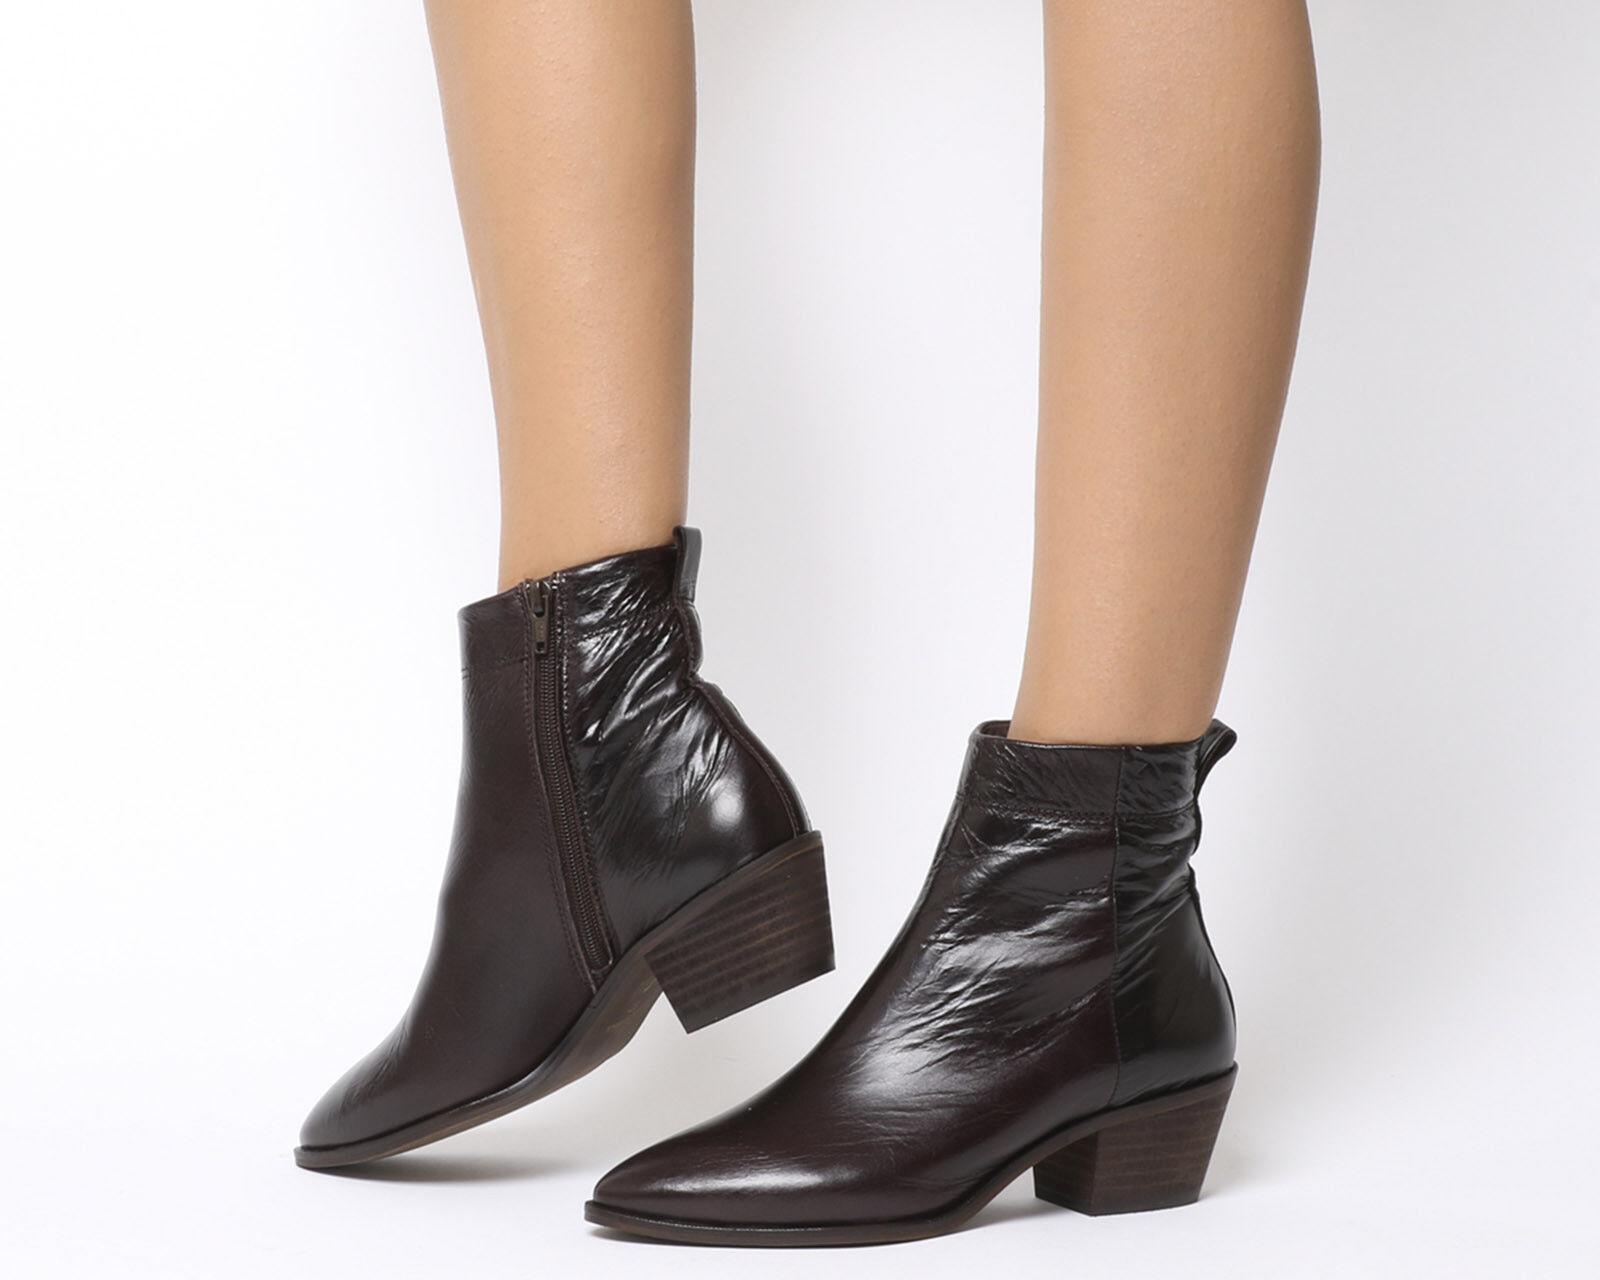 damen Office Gelb High Cut Stiefel Chocolate Leather Stiefel